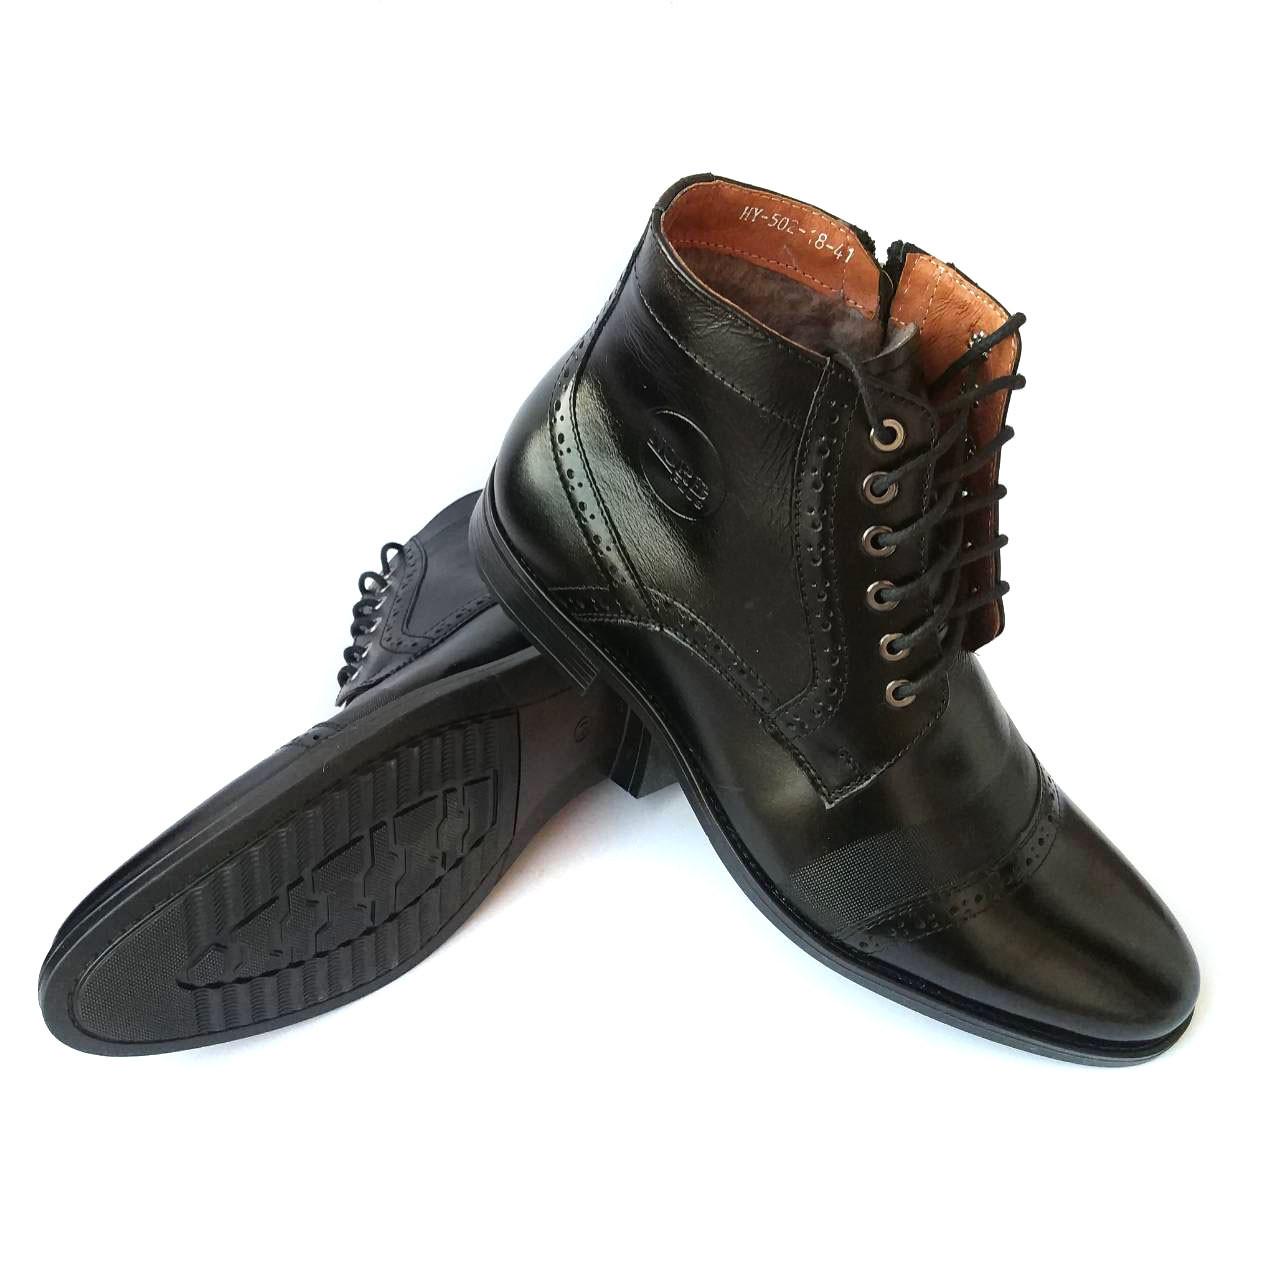 Какой цвет ботинок